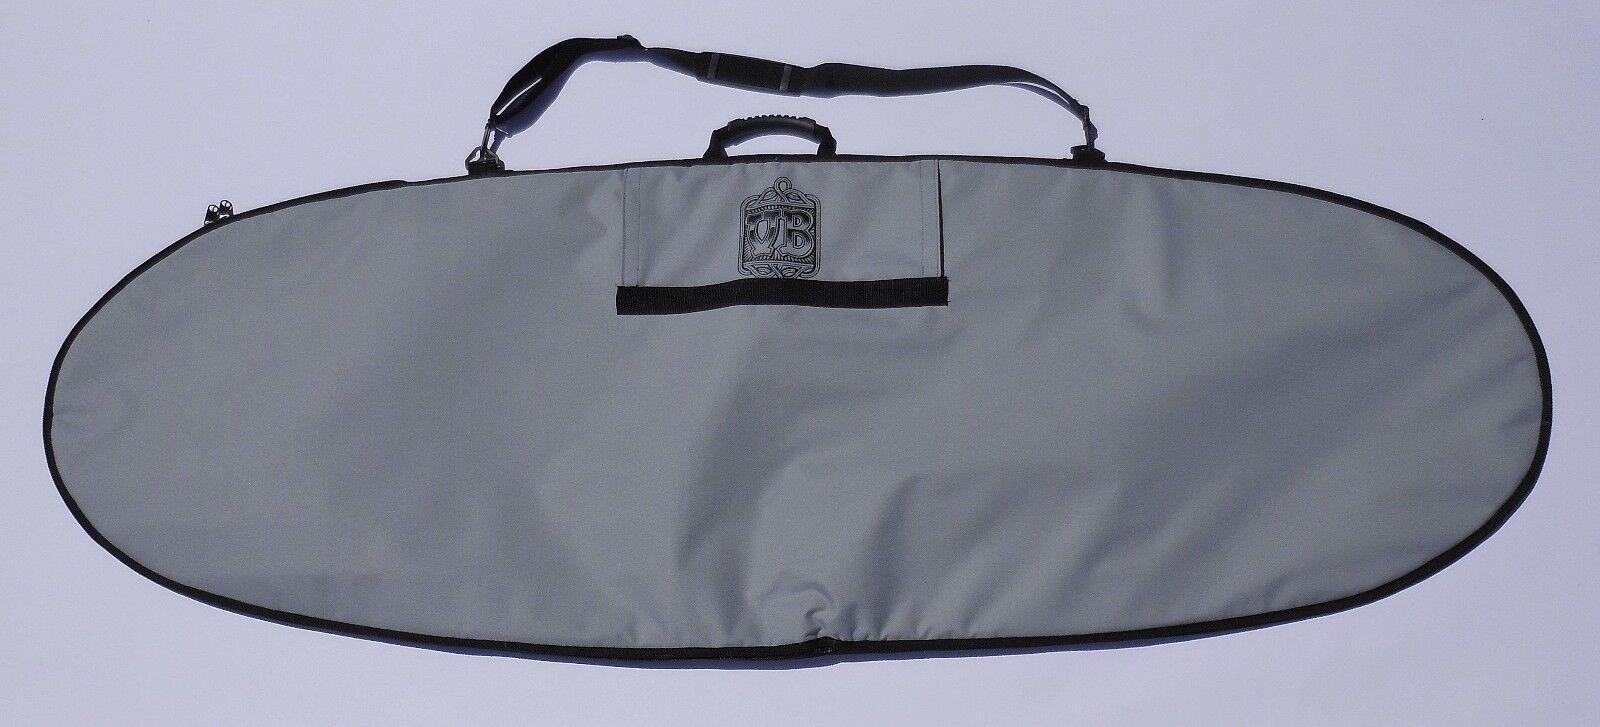 Vitamin bluee 6'6  x 26  Fish Bag (MADE in U.S.A.) by Vitamin bluee